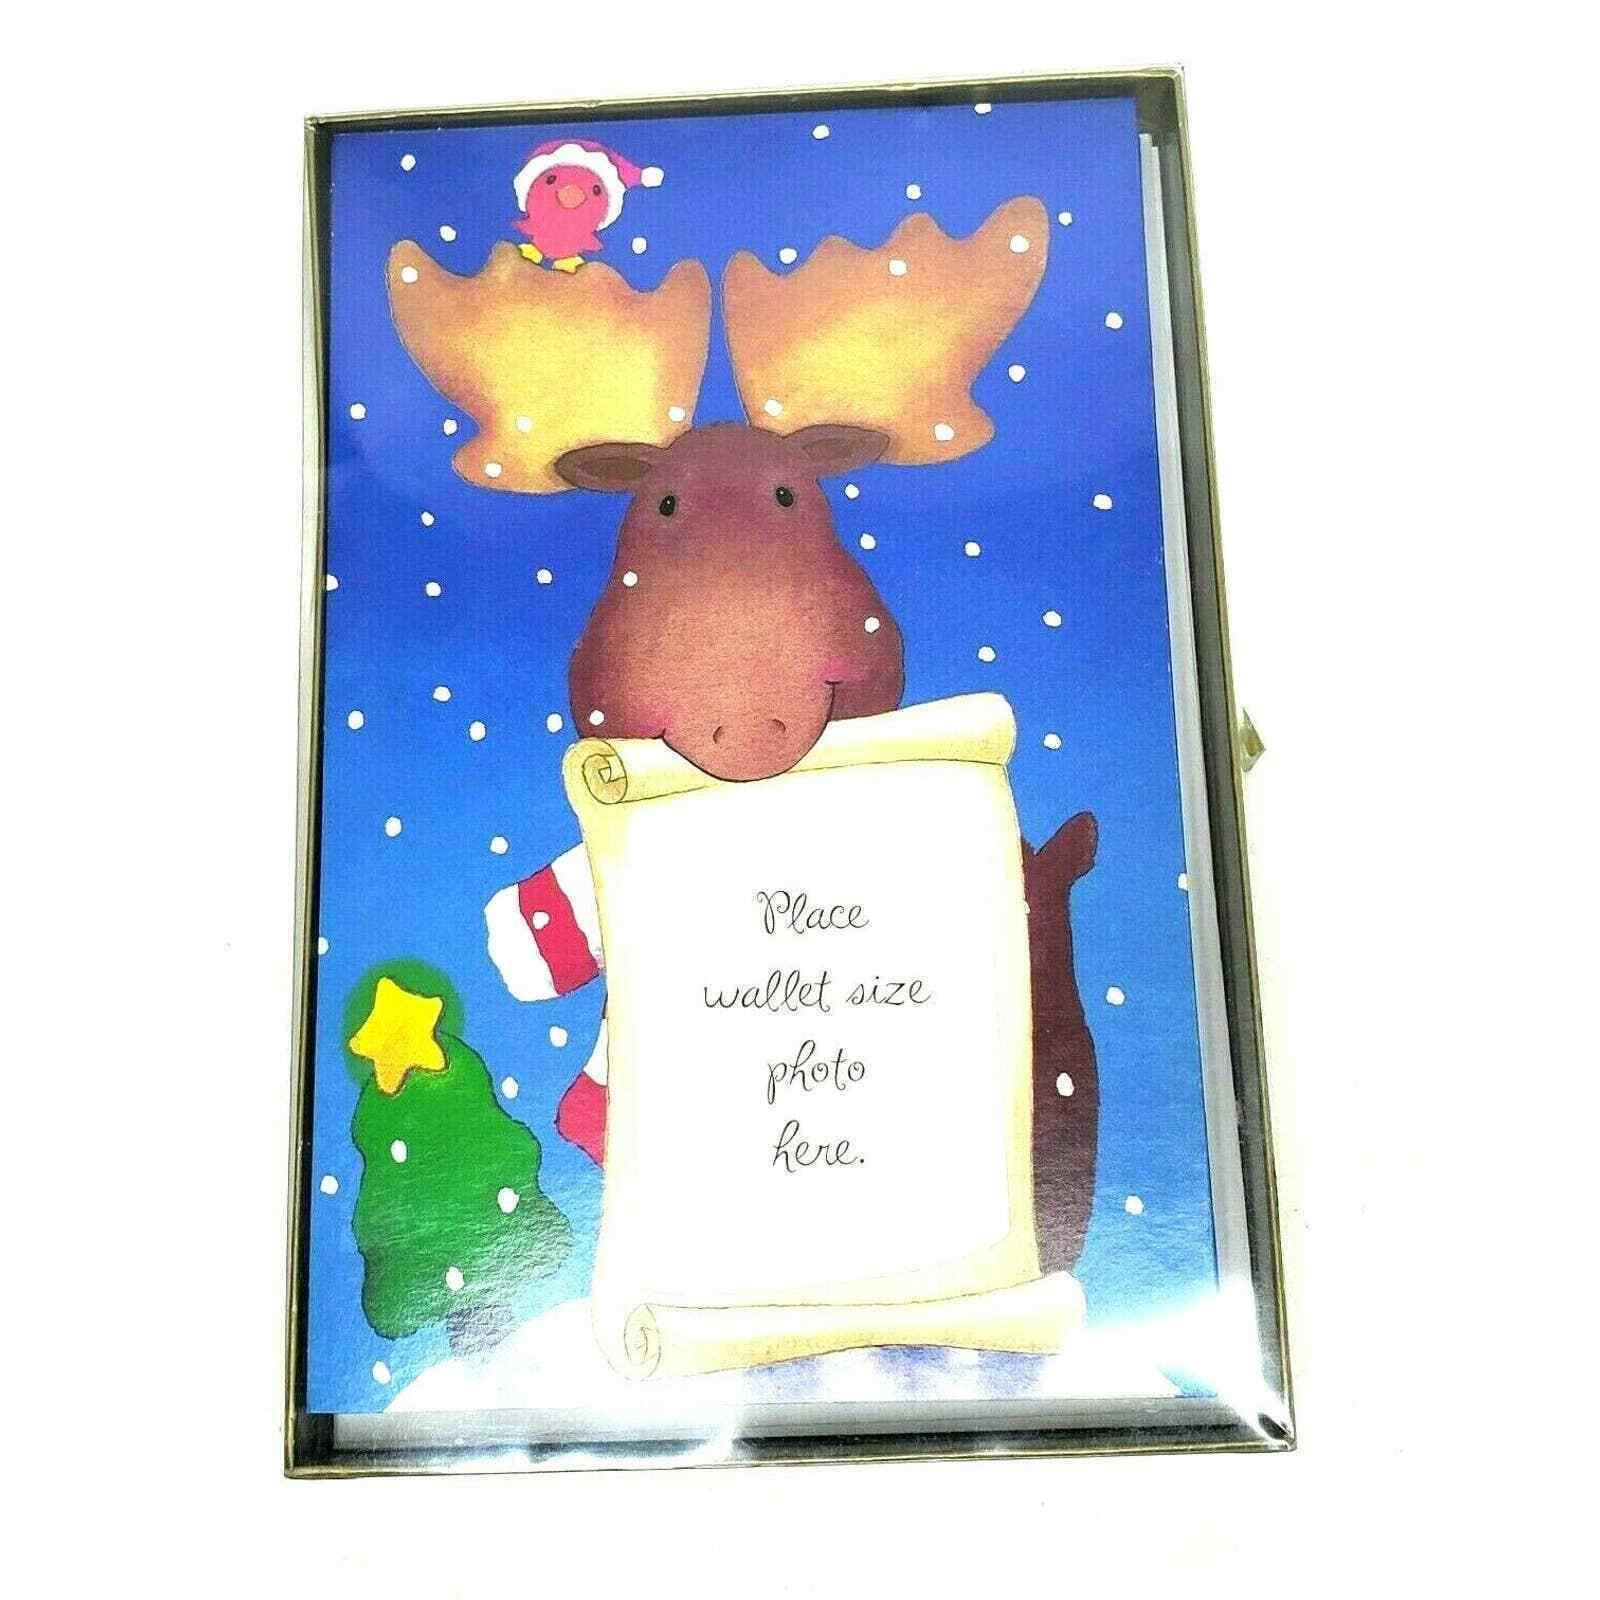 American Greetings Photo Christmas Cards Blue Reindeer 10 ct Box Kid Holiday - $9.99